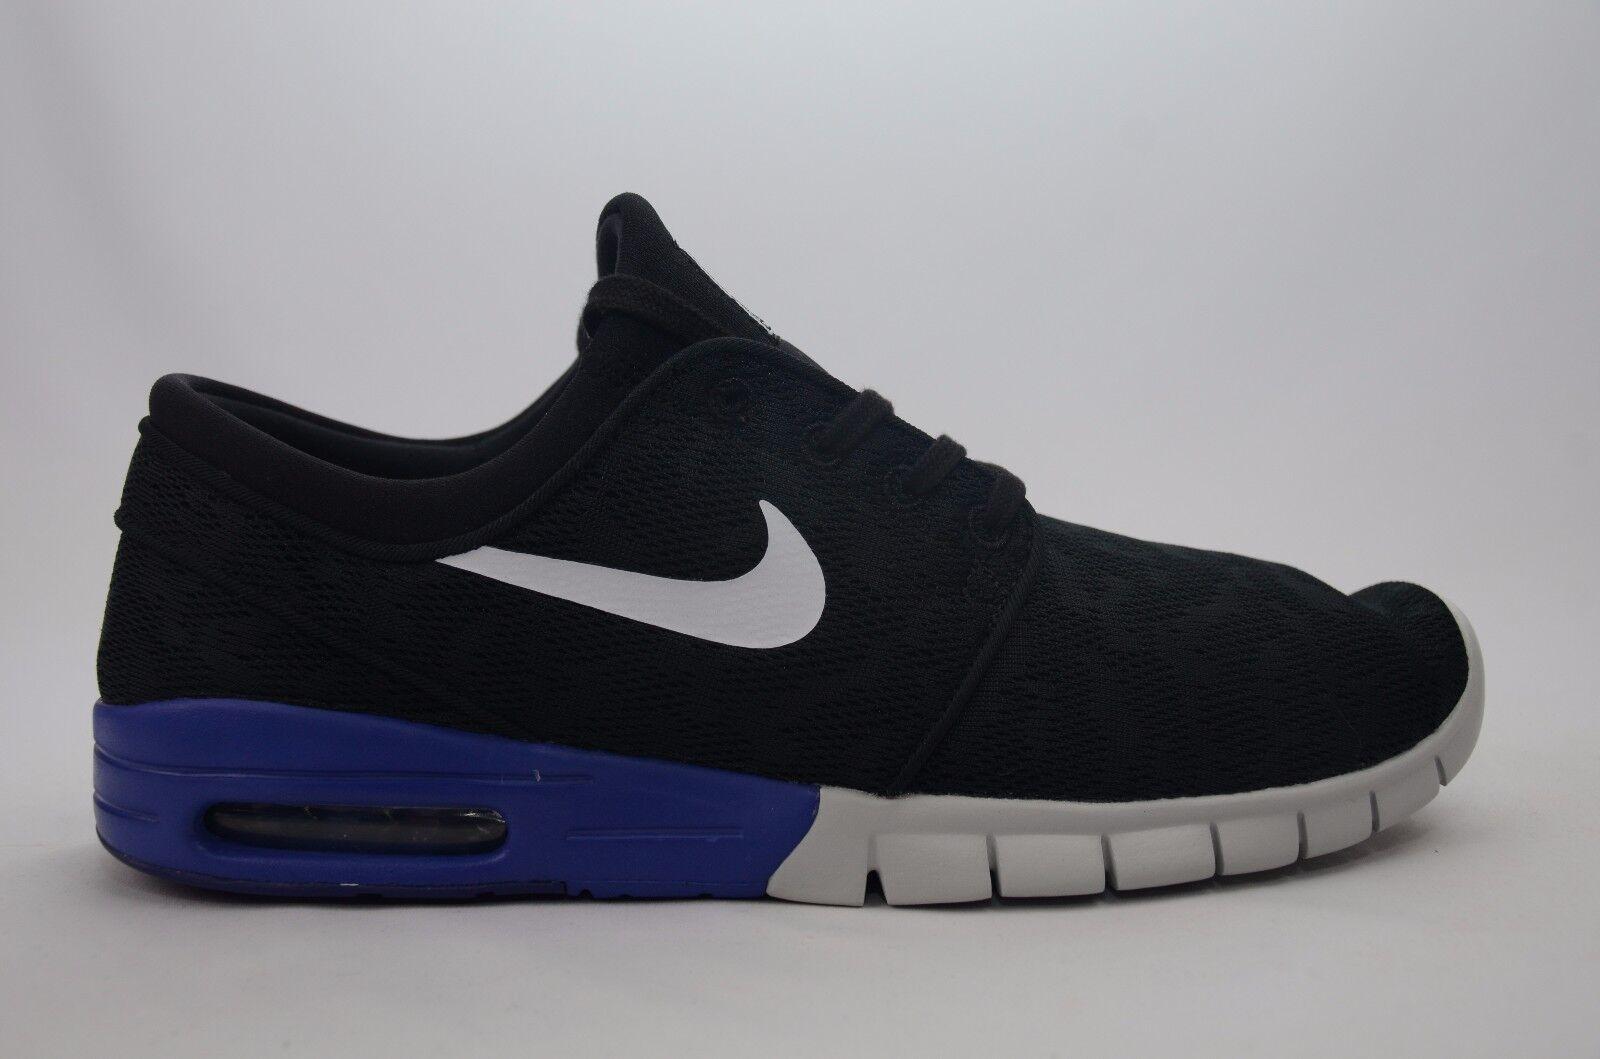 Nike Stefan Janoski Max Uomo Size 9-13 Nero/Deep Night New in Box 631303 015